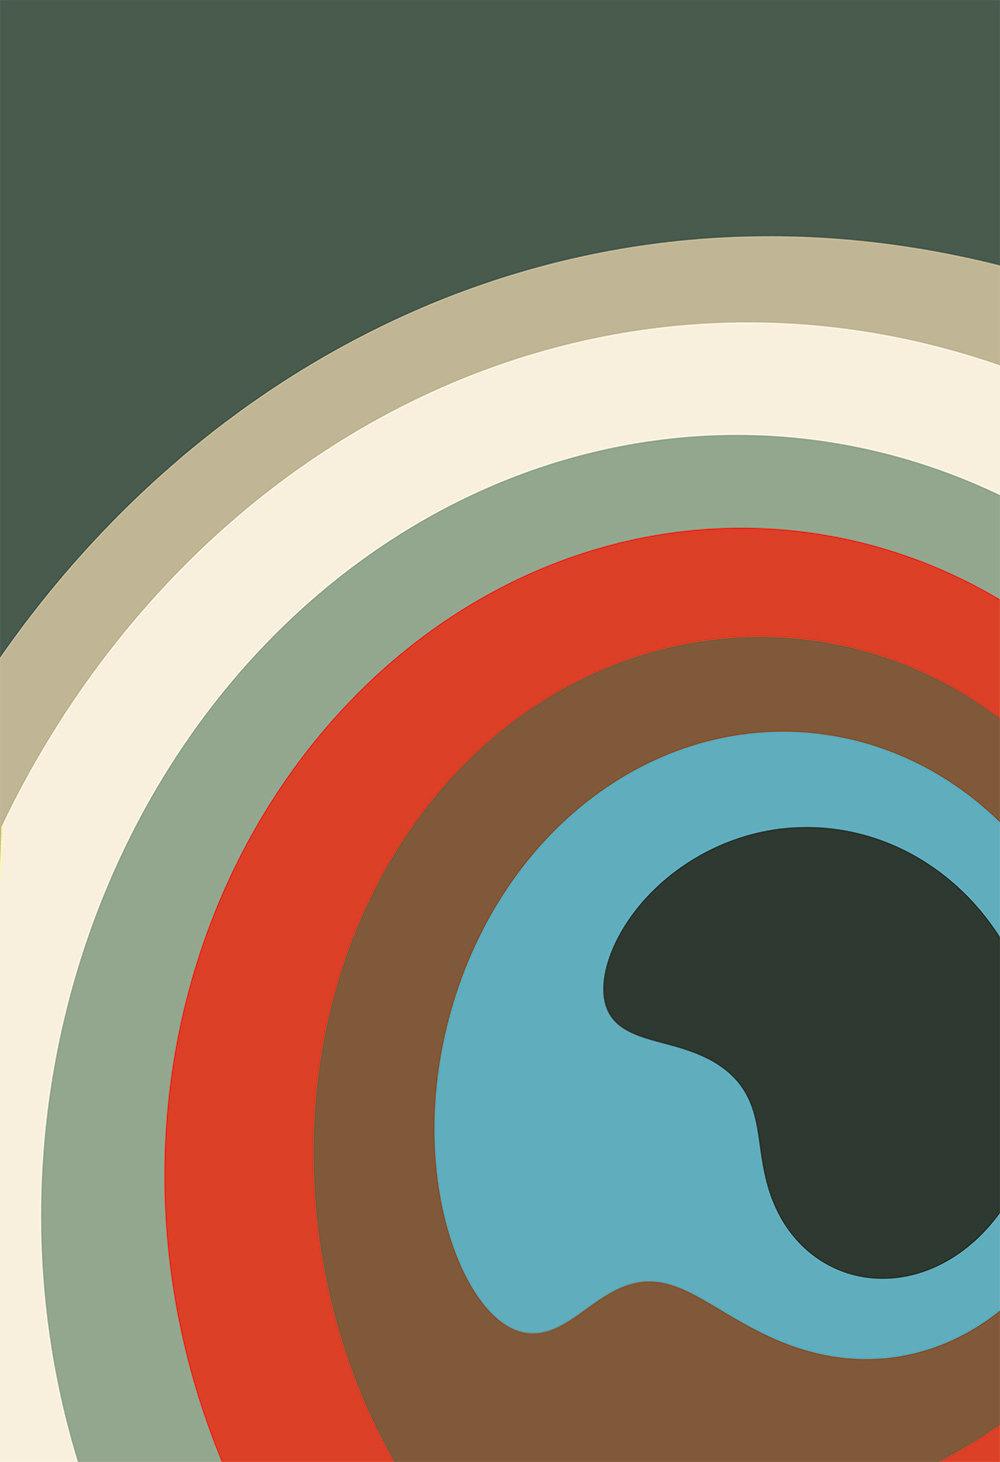 Mid Century Modern Ceiling Light Fixture: Mid Century Modern Print Abstract Art Print Poster Giclee